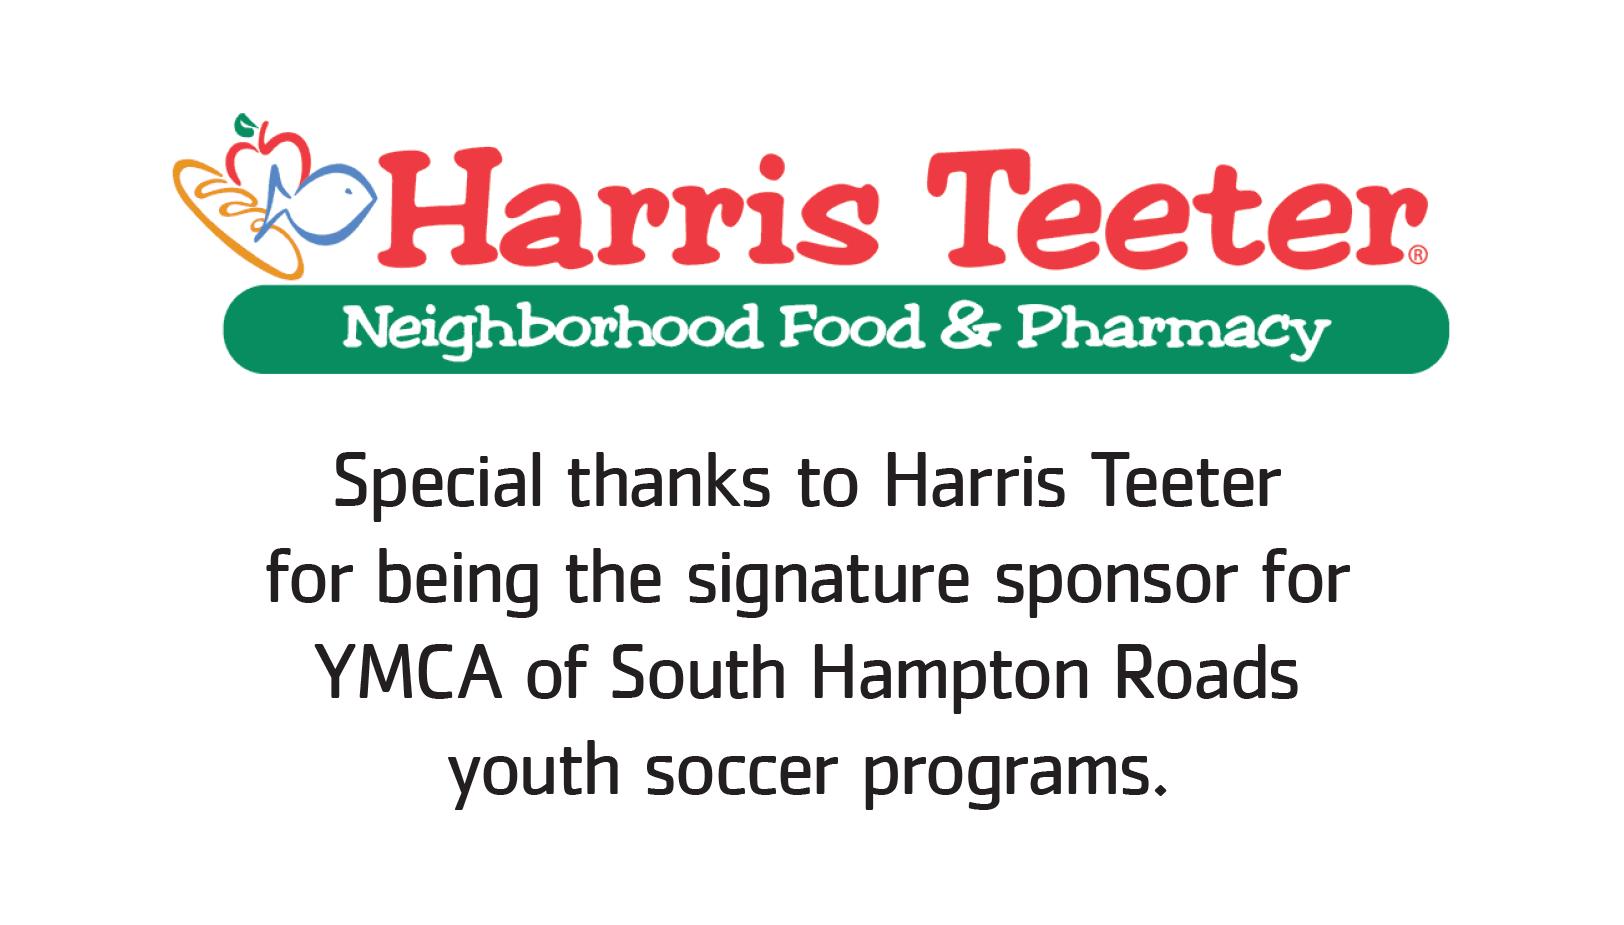 Thank you, Harris Teeter!